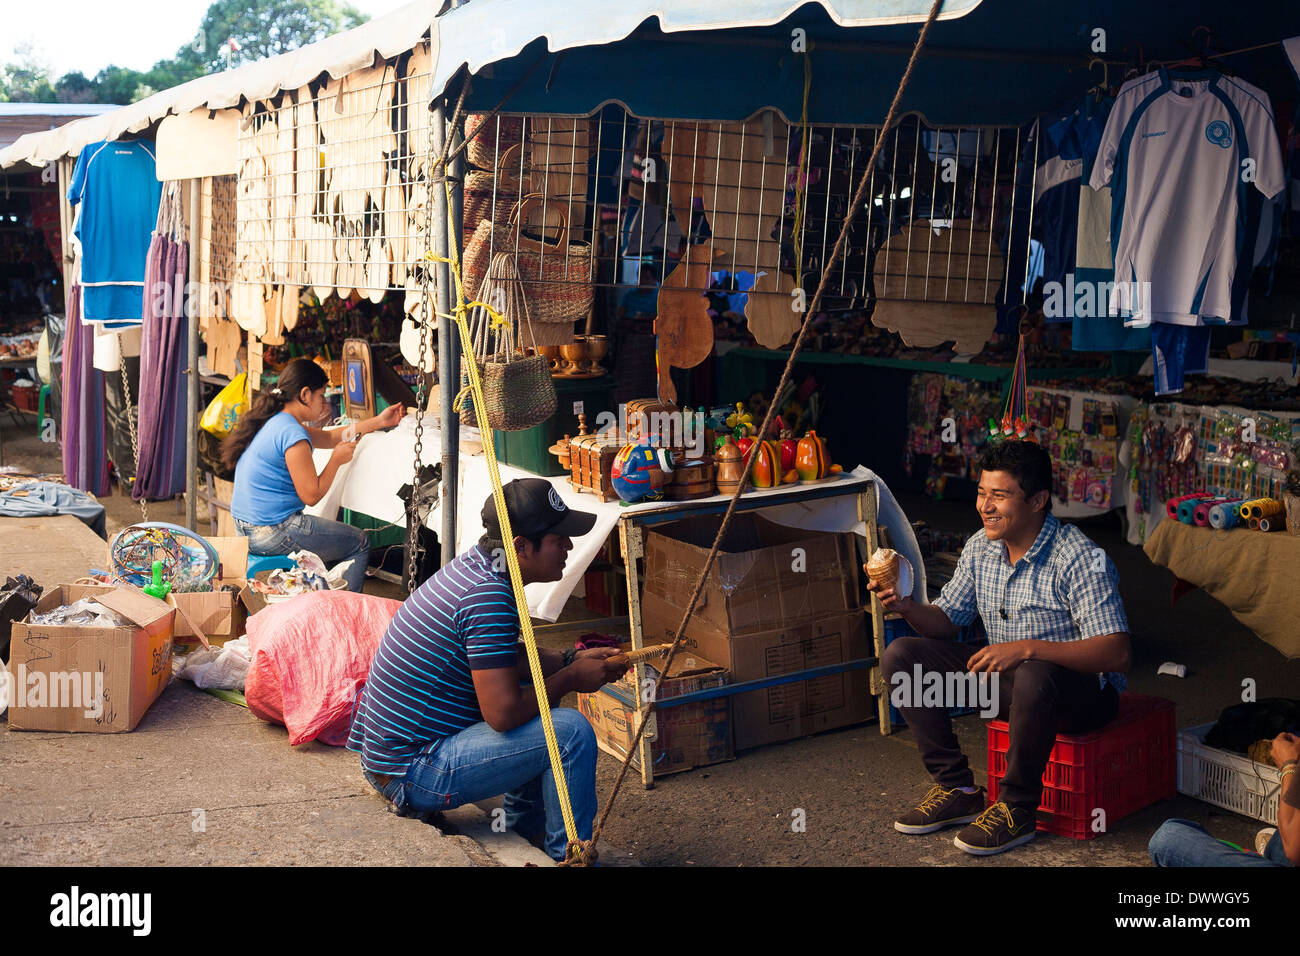 Vendors laugh and joke during a break at the weekend market in Juayua on the rutas de la flores in El Salvador - Stock Image